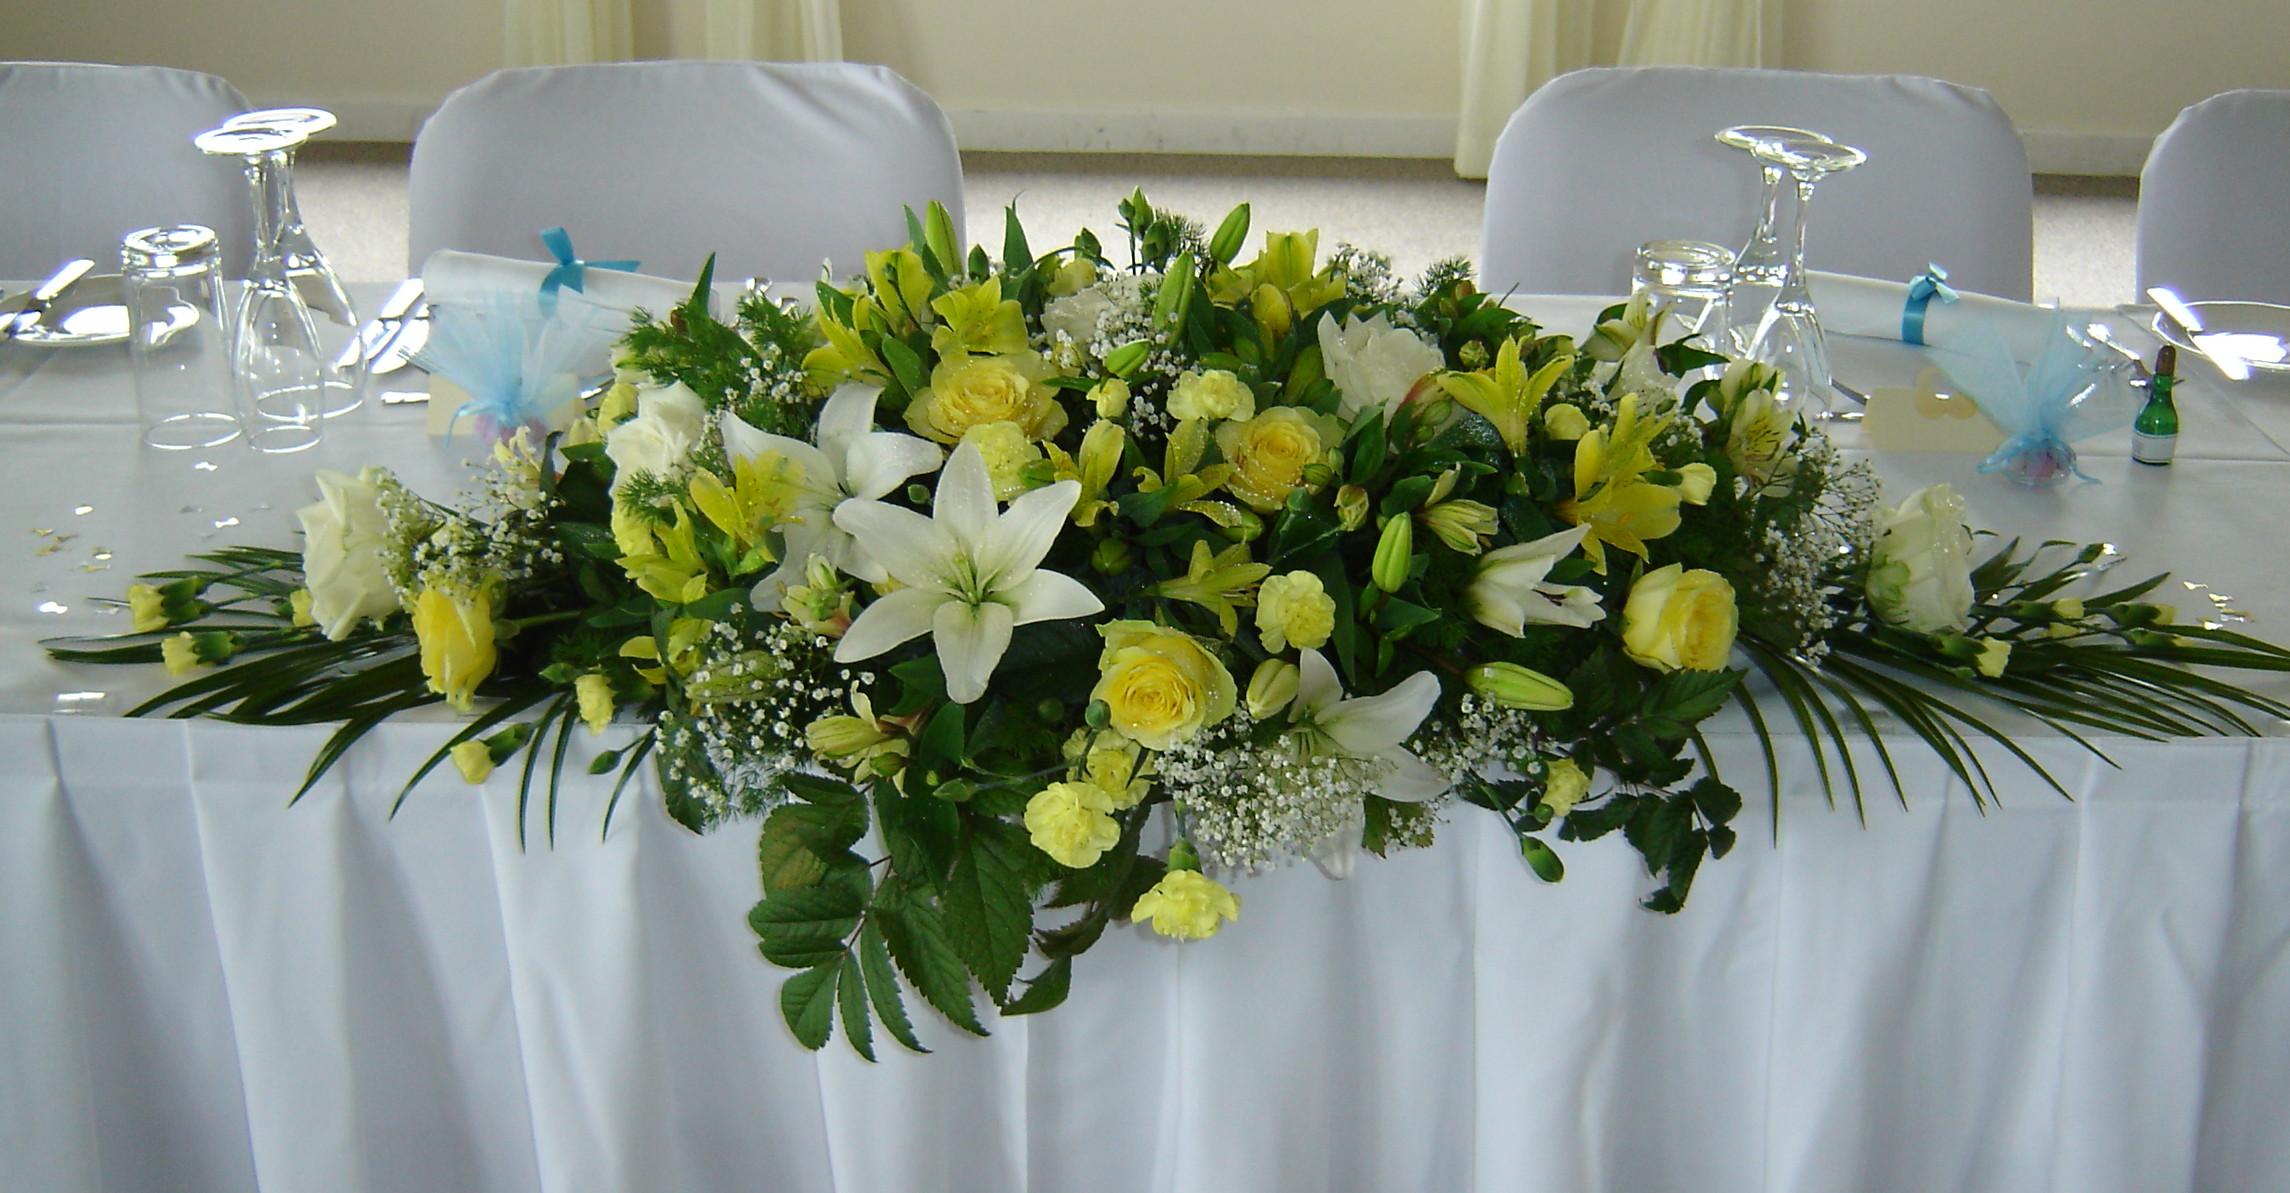 Excellent Flower Arrangement For Wedding On Wedding Flowers With Flower Arrangements For Tables At Wedding Flower Arrangements